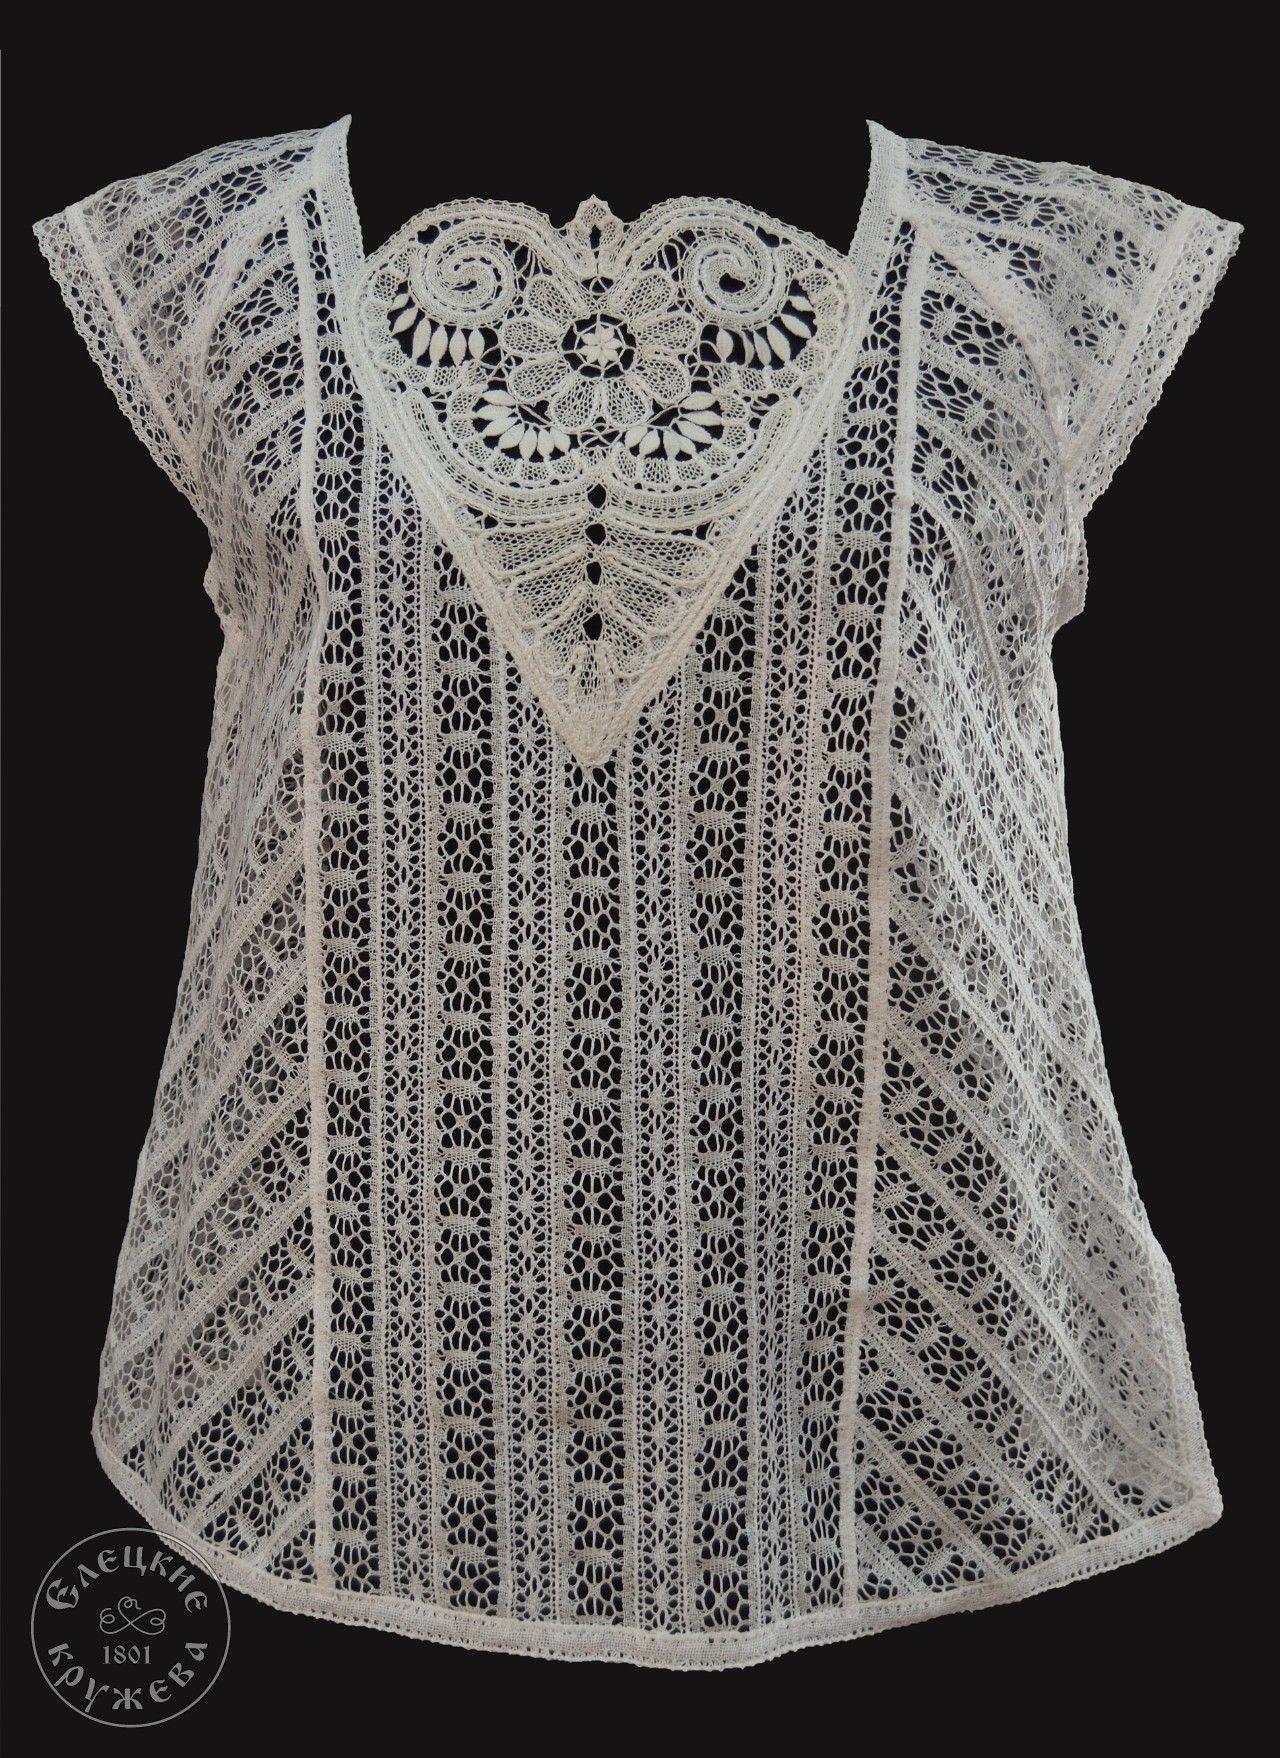 Yelets lace / Women's lace blouse С2195